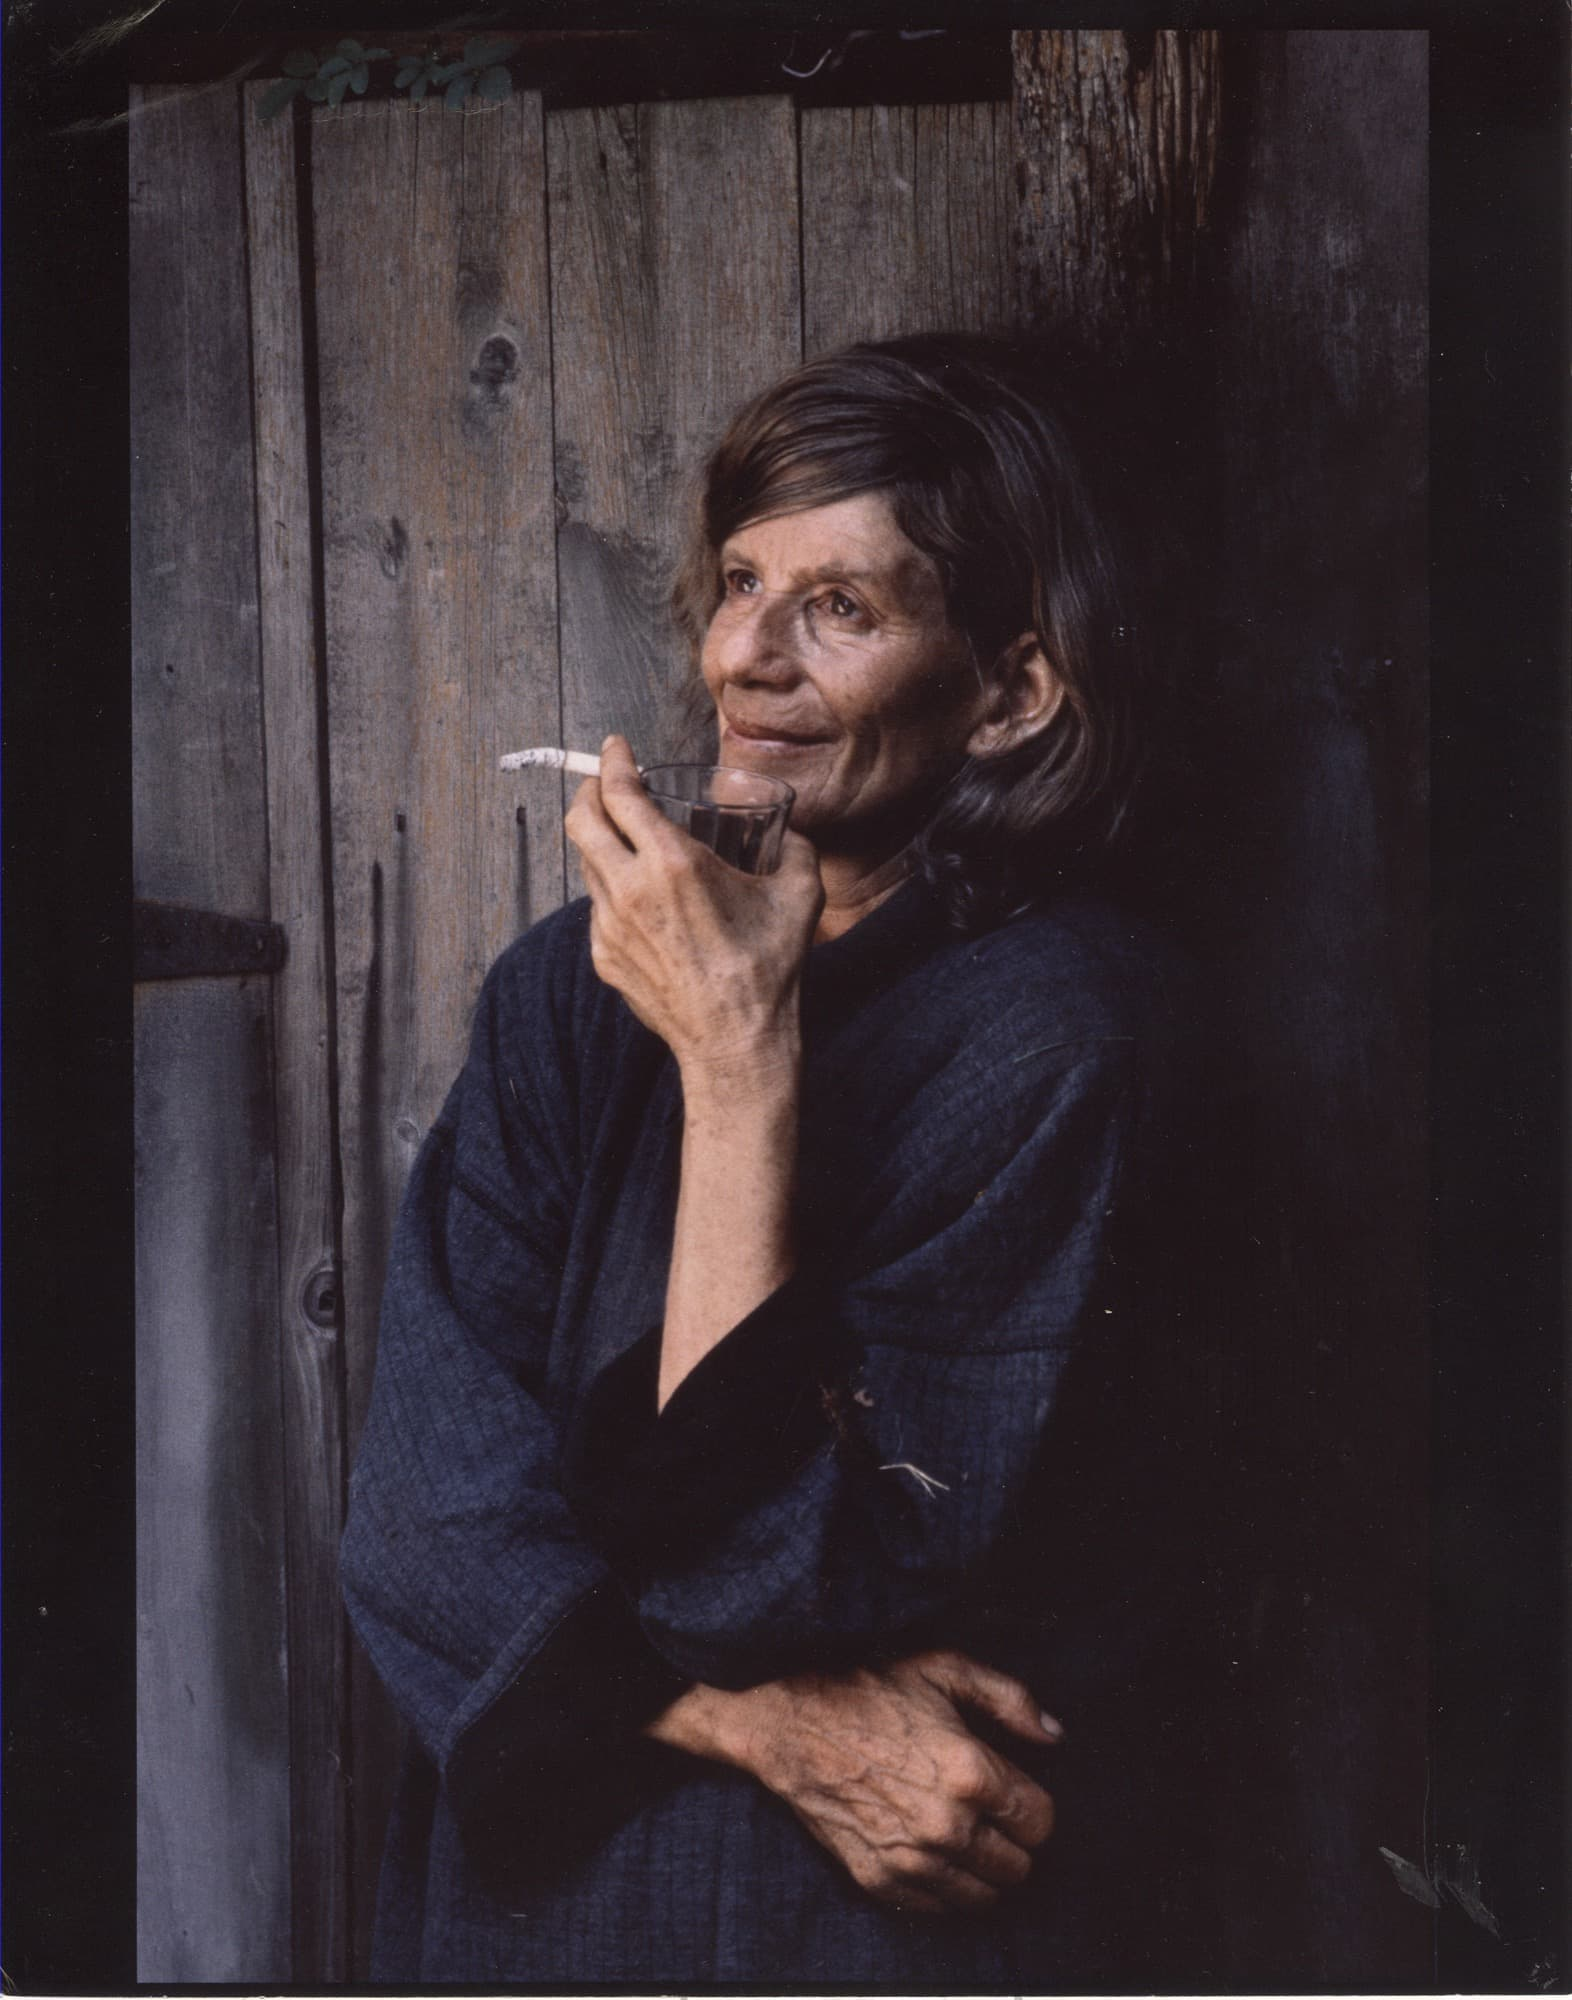 Keri Claussen 1995, 1997-1998 pics